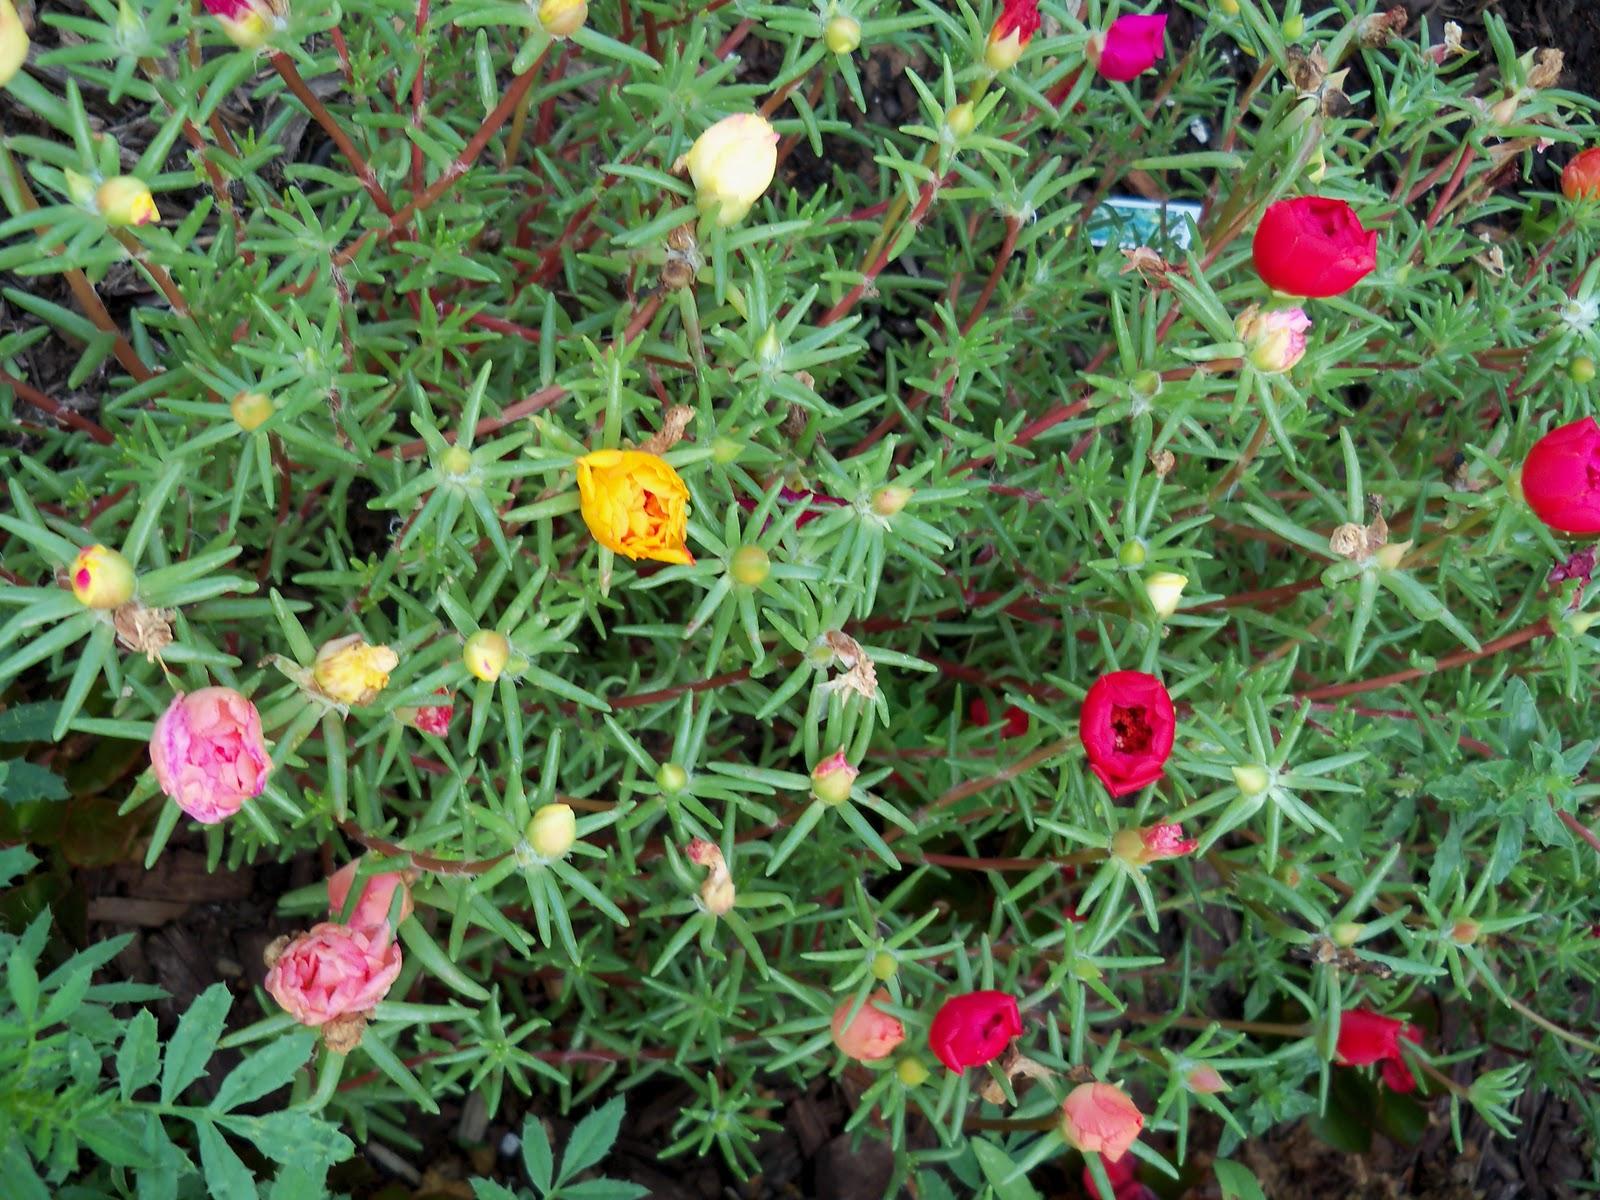 Gardening 2010, Part Two - 101_2990.JPG